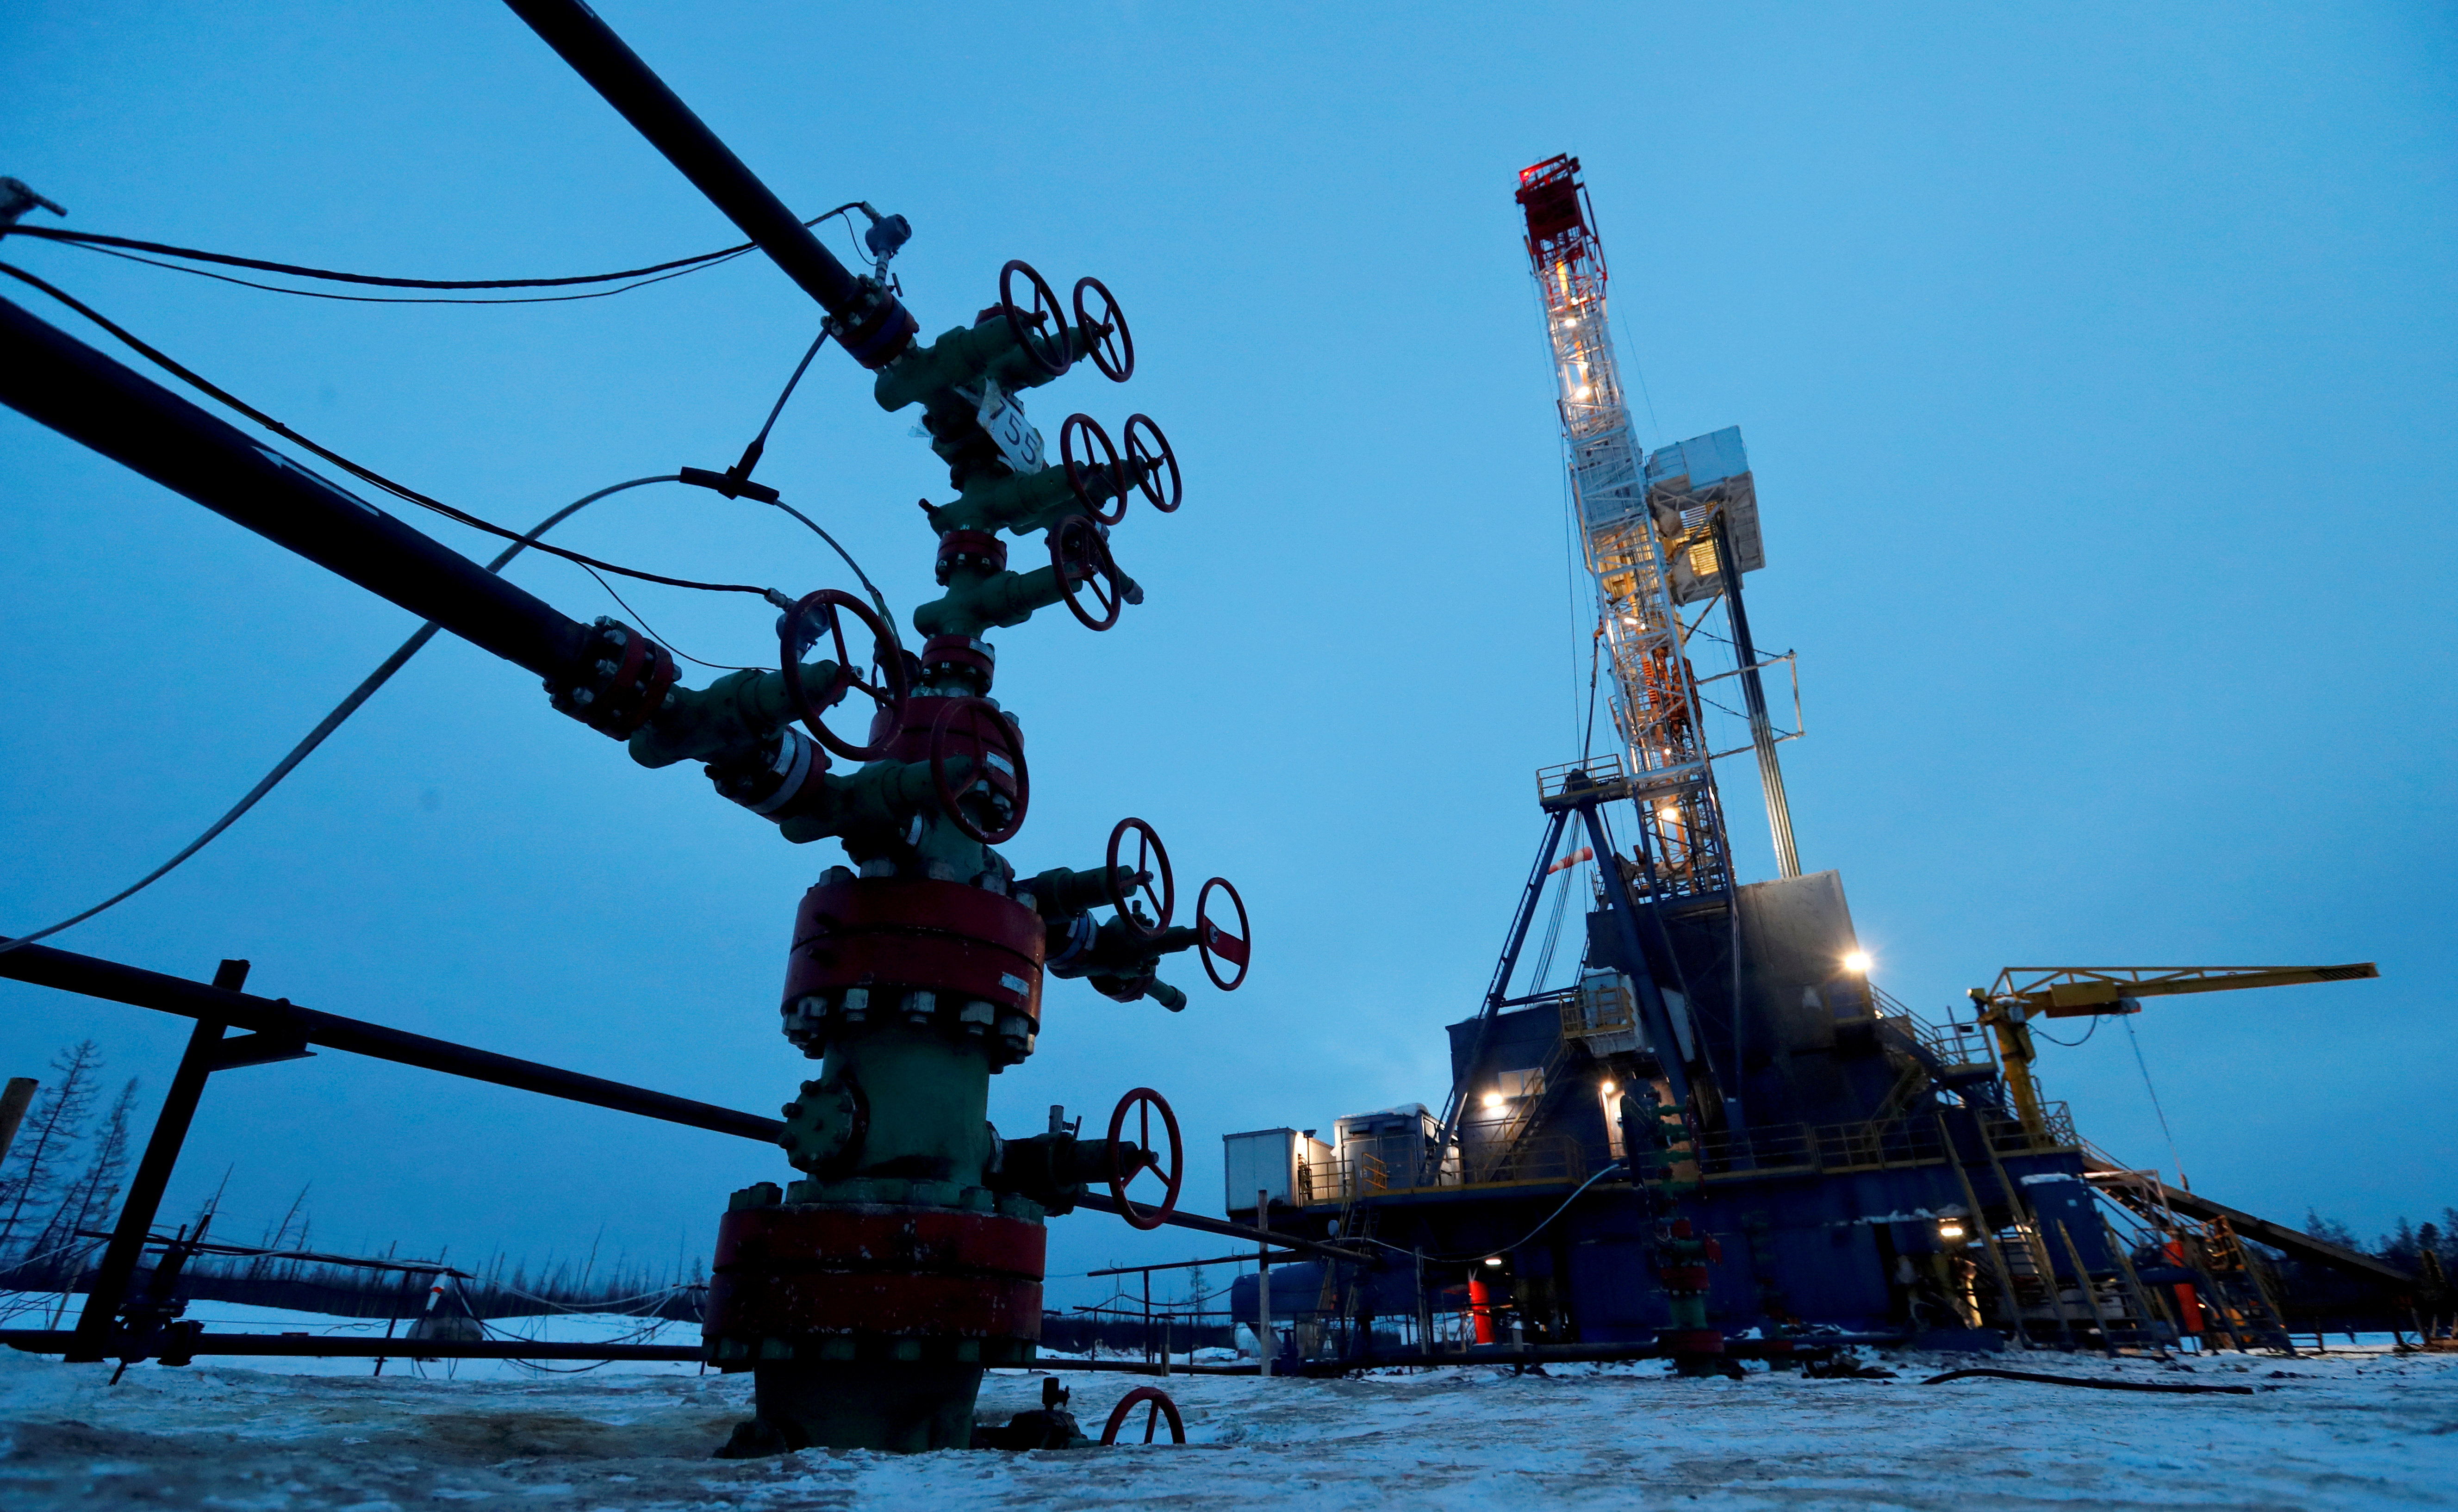 A well head and drilling rig in the Yarakta oilfield, owned by Irkutsk Oil Company (INK), in the Irkutsk region, Russia, March 11, 2019. REUTERS/Vasily Fedosenko/File Photo